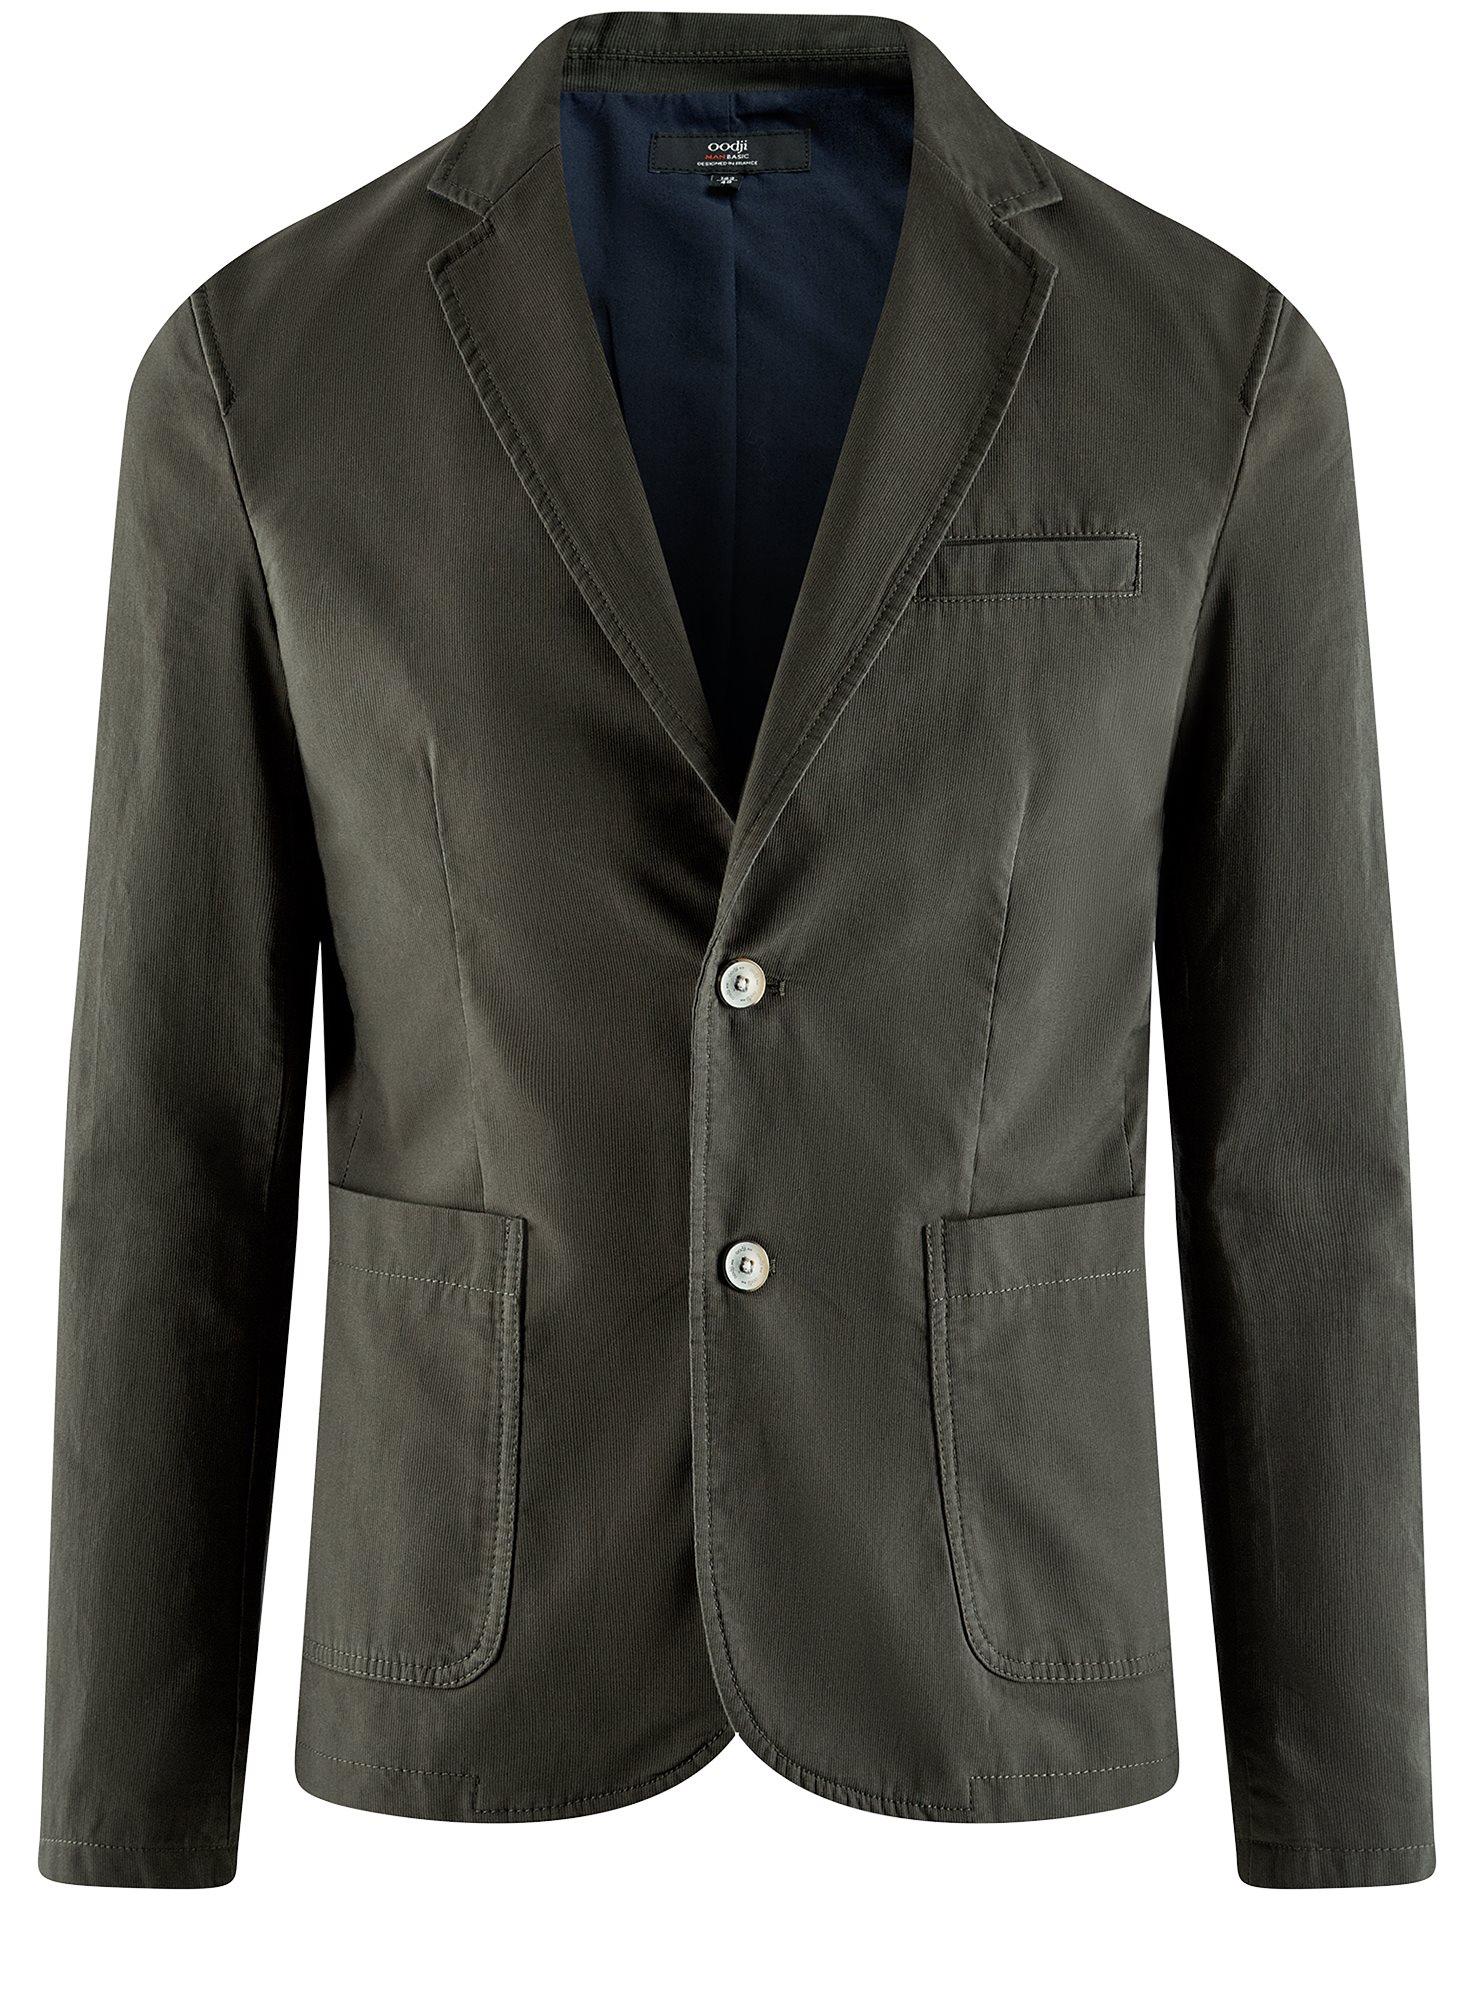 Пиджак приталенный с накладными карманами oodji для мужчины (зеленый), 2B510005M/39355N/6600N